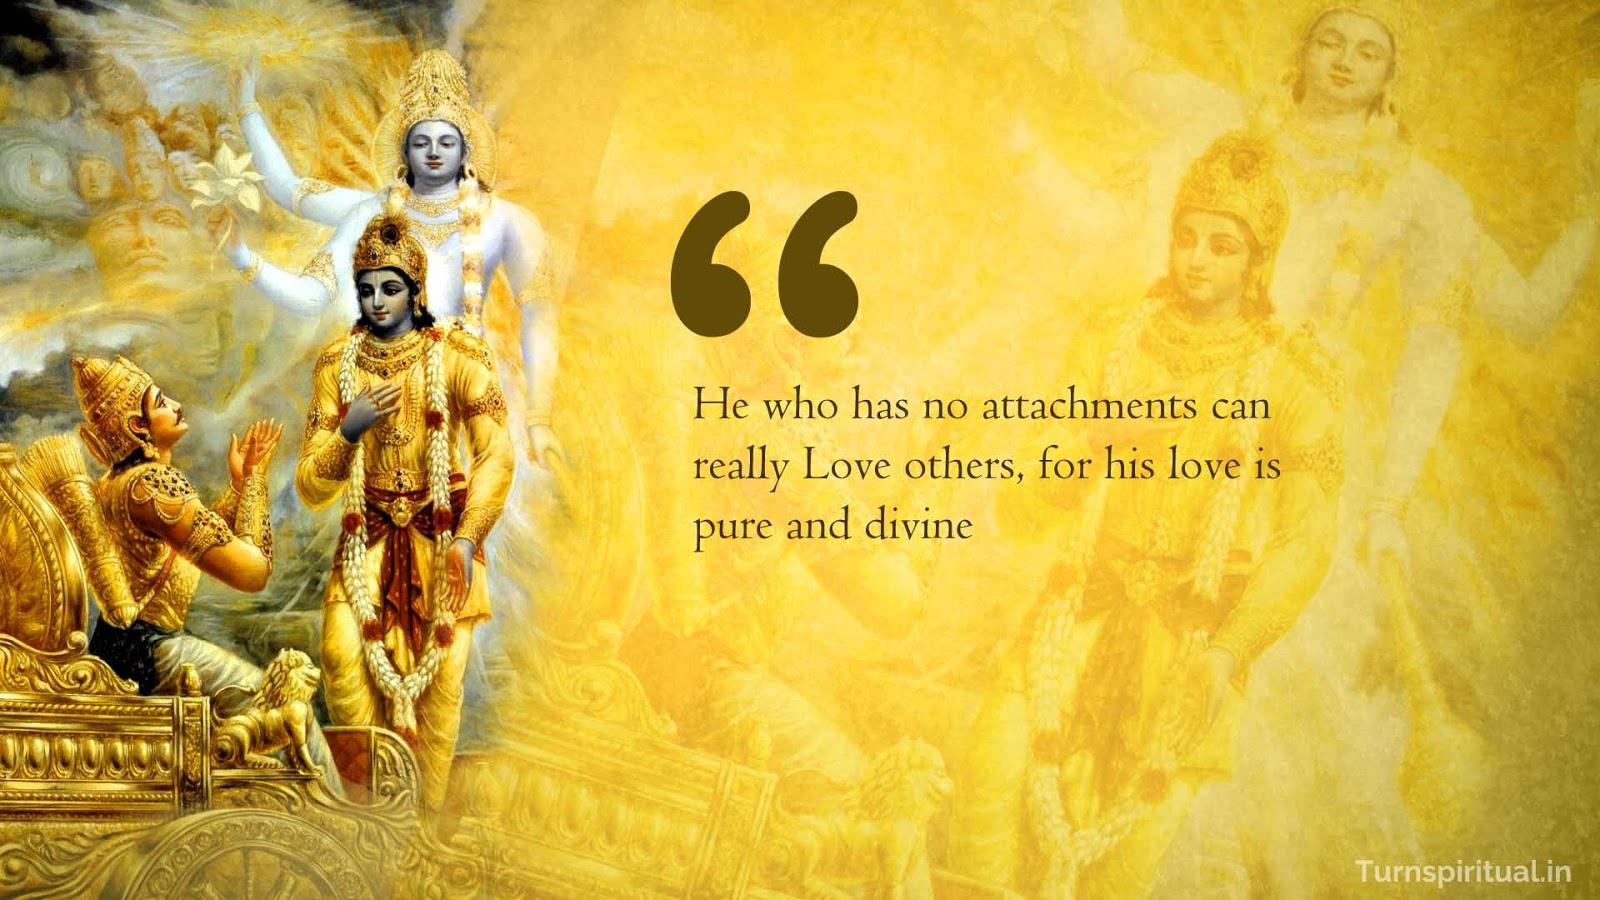 Quotes By Lord Krishna From Bhagavadgita Wordzz